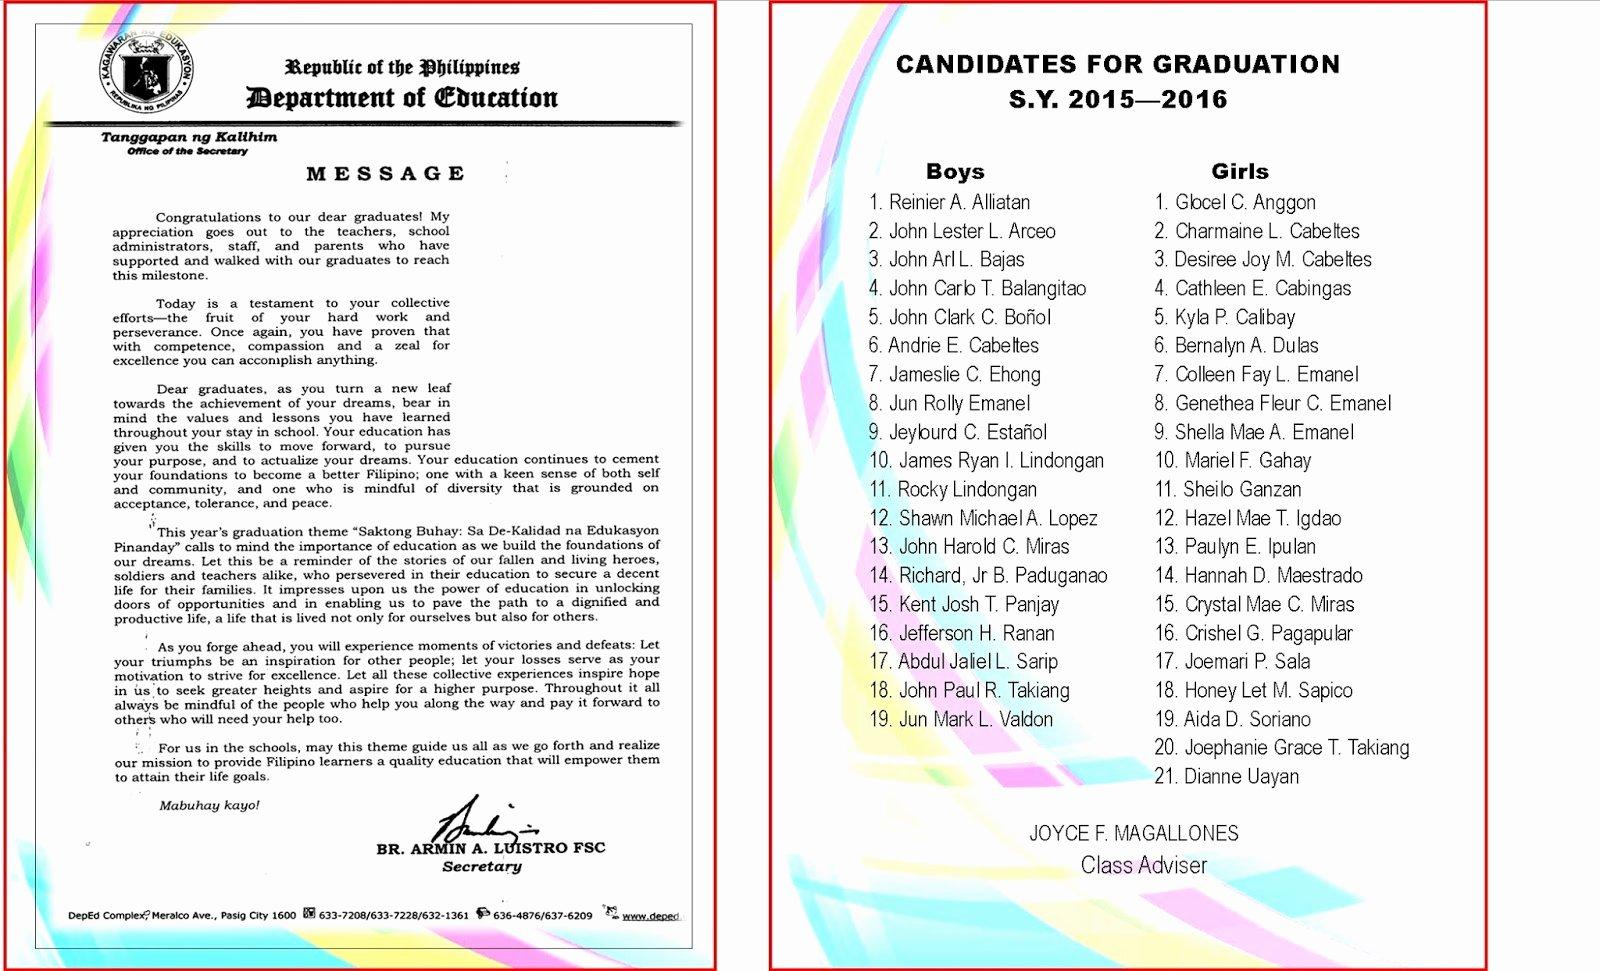 Preschool Graduation Programs Template Awesome 2015 2016 Graduation Program New Template Deped Lp S